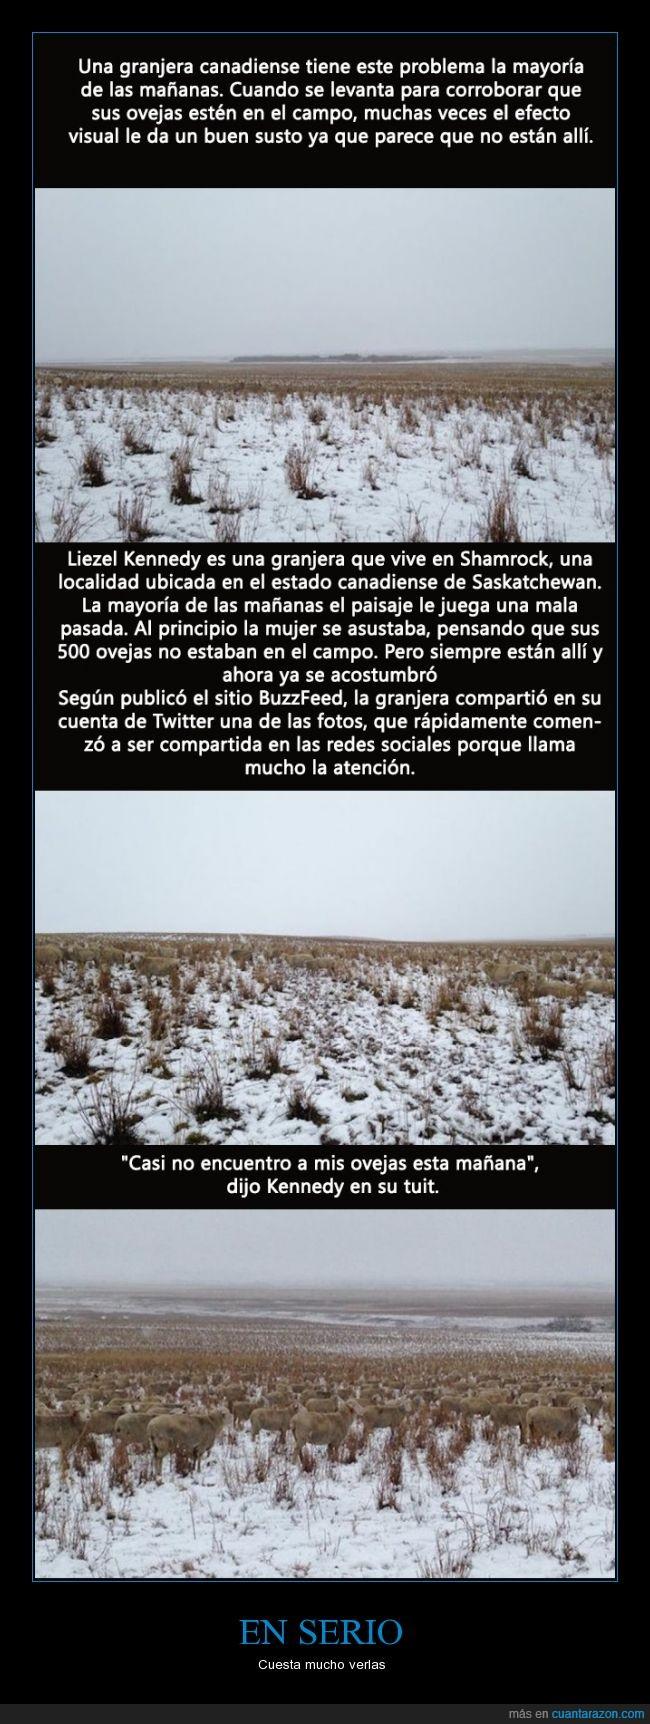 campo,camuflar,Canada,Liezel Kennedy,mirar,nevado,nieve,oveja,perder,Shamrock,ver